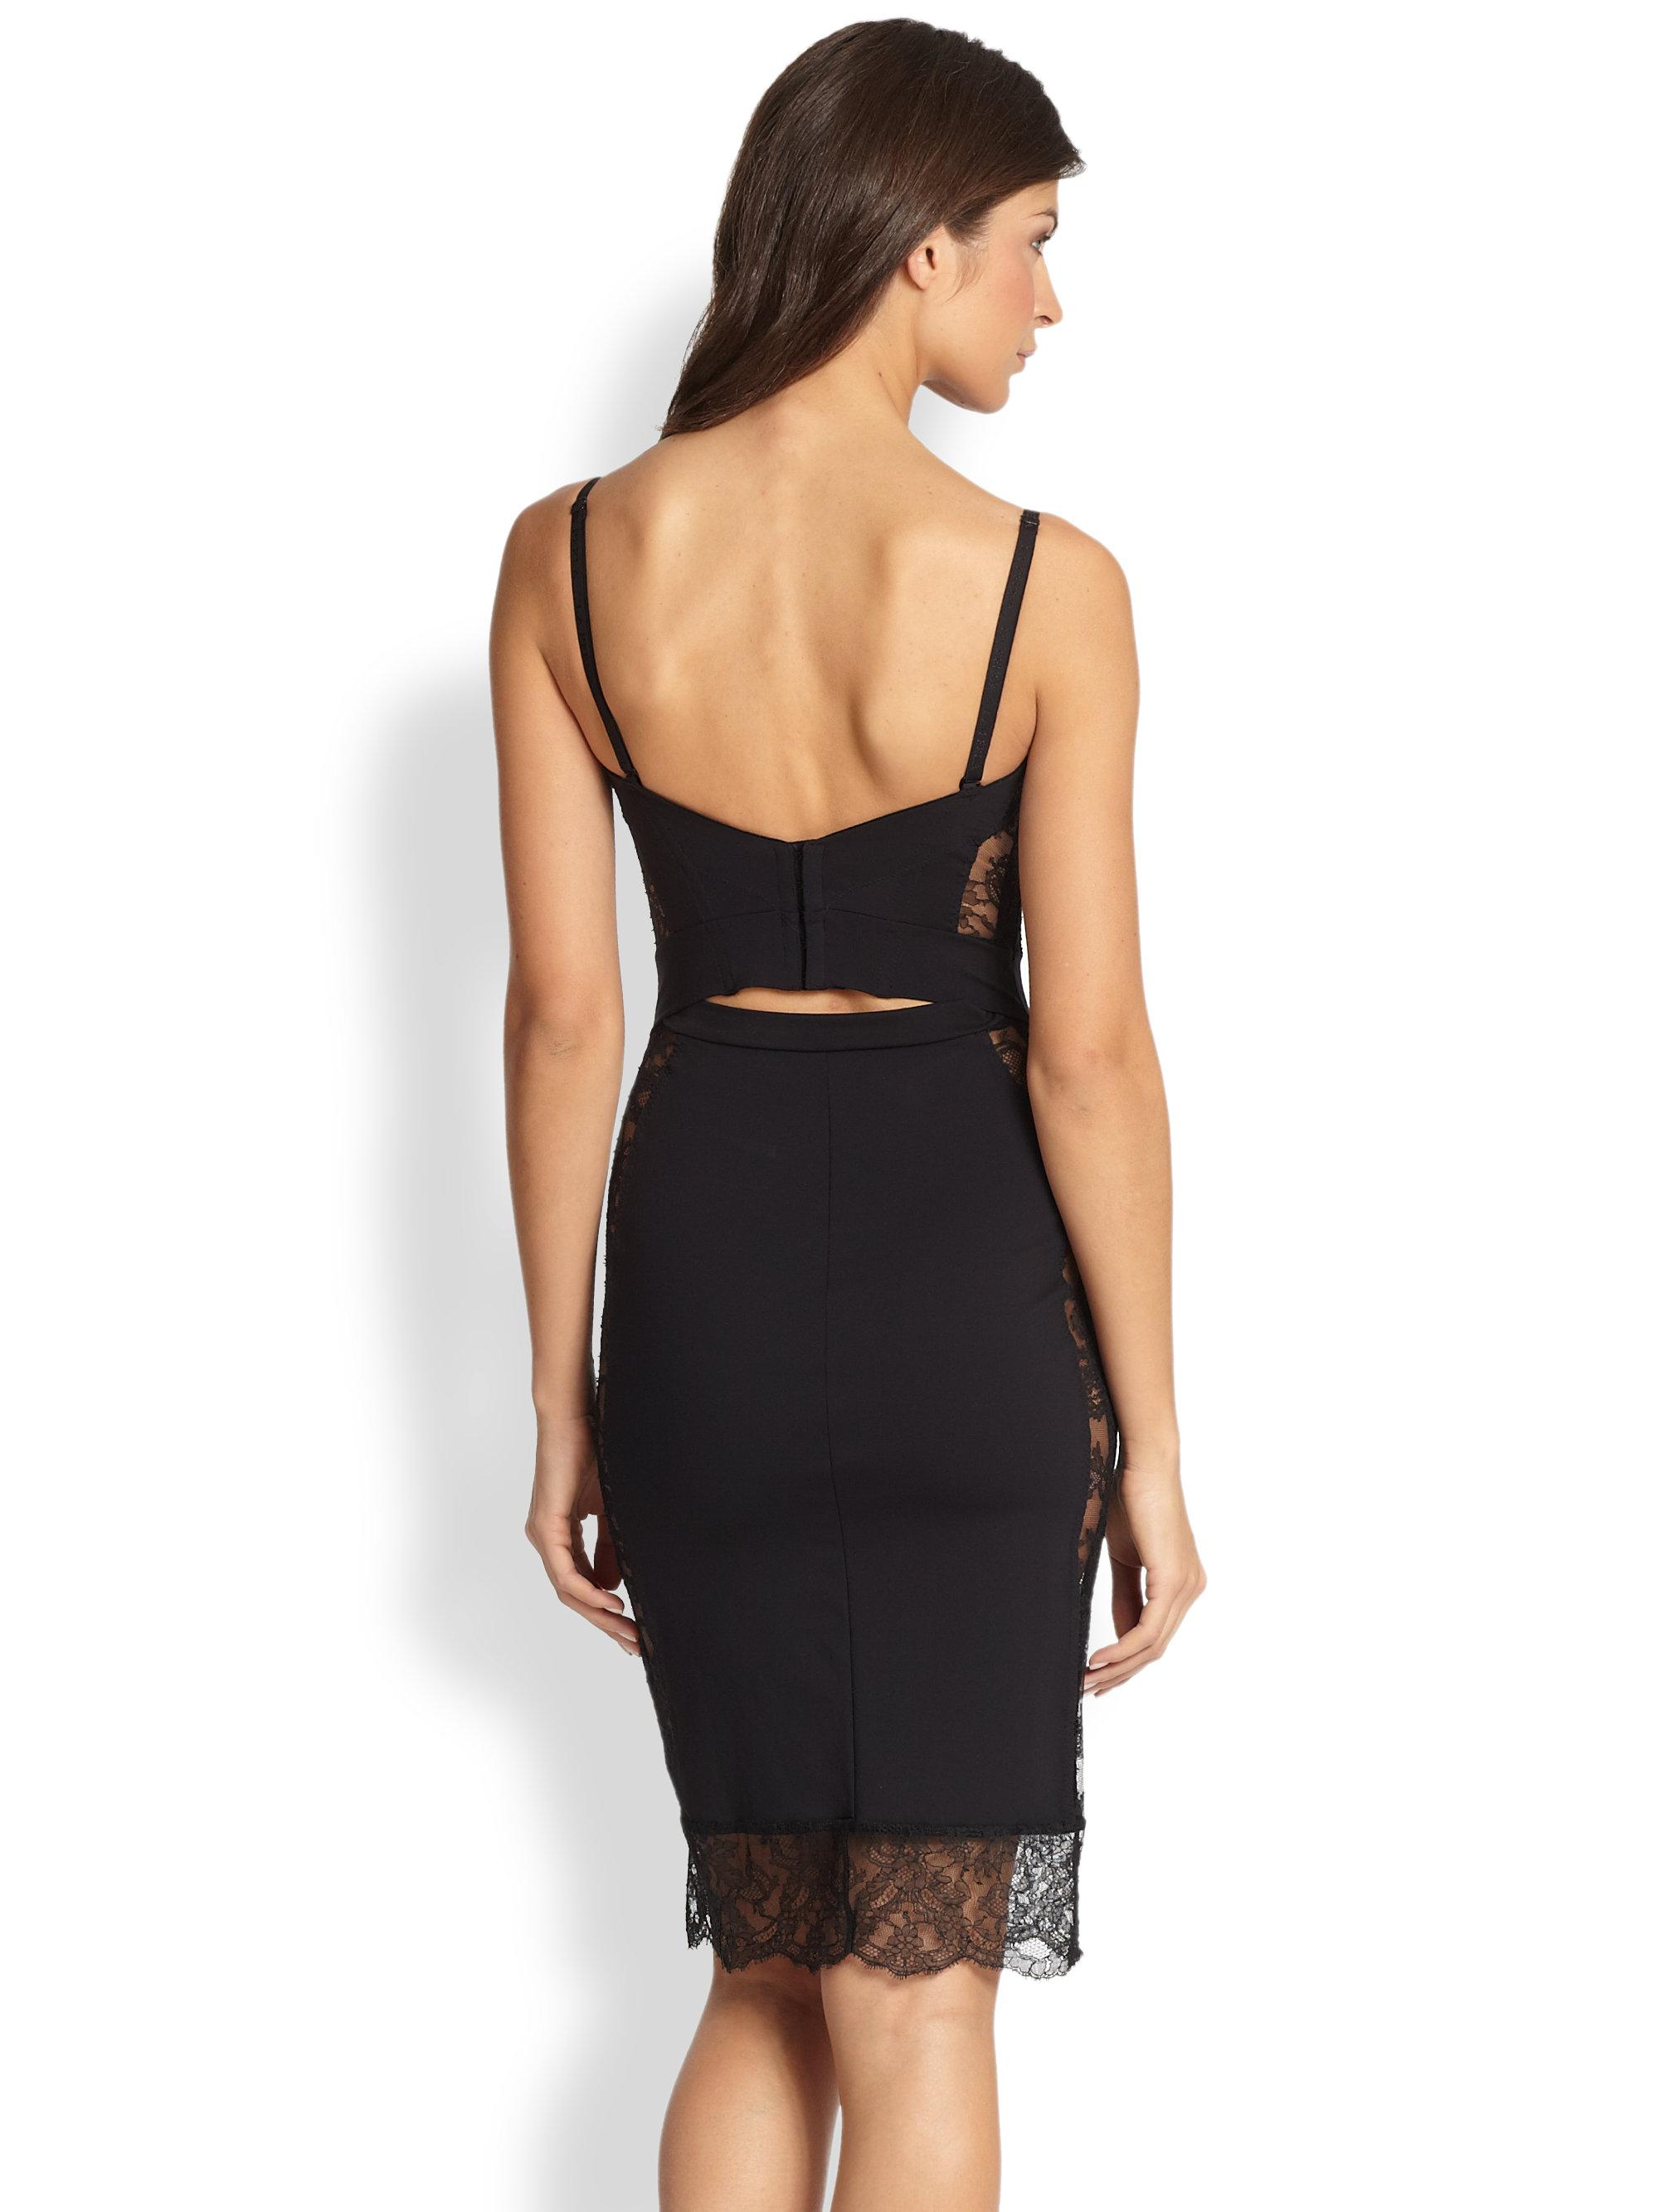 la perla shape allure convertible slip dress in black lyst. Black Bedroom Furniture Sets. Home Design Ideas